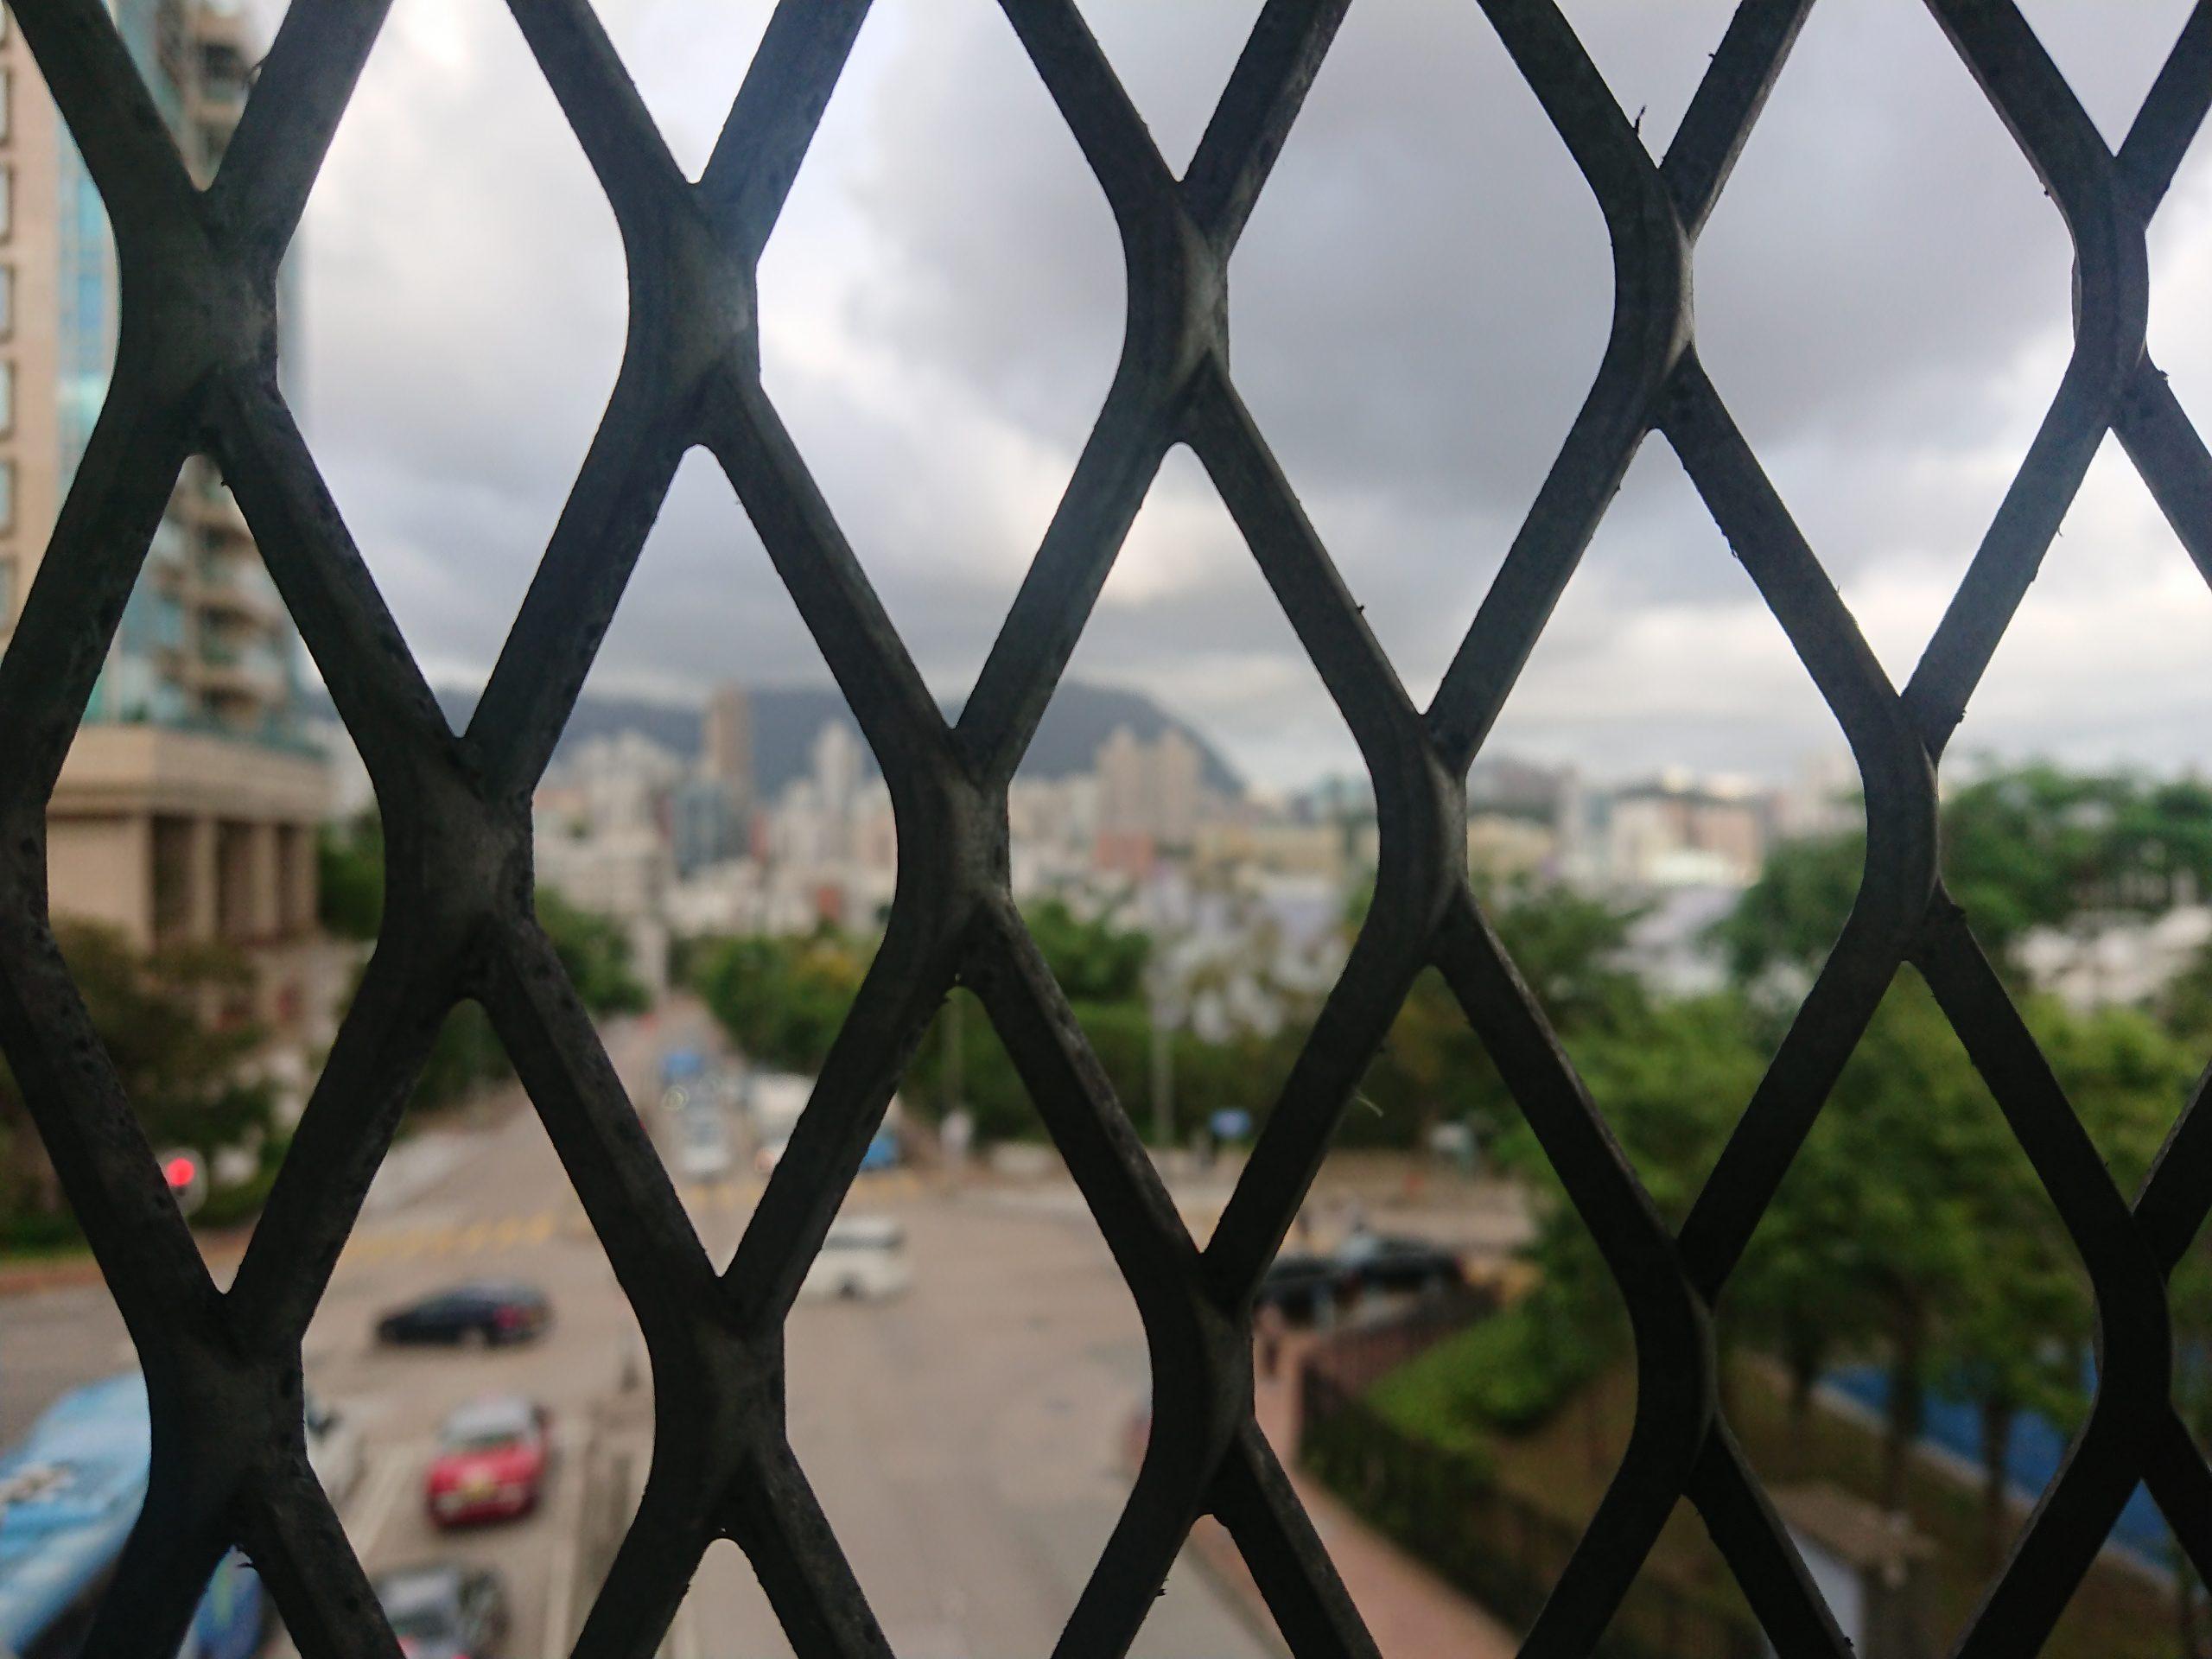 11. Caged